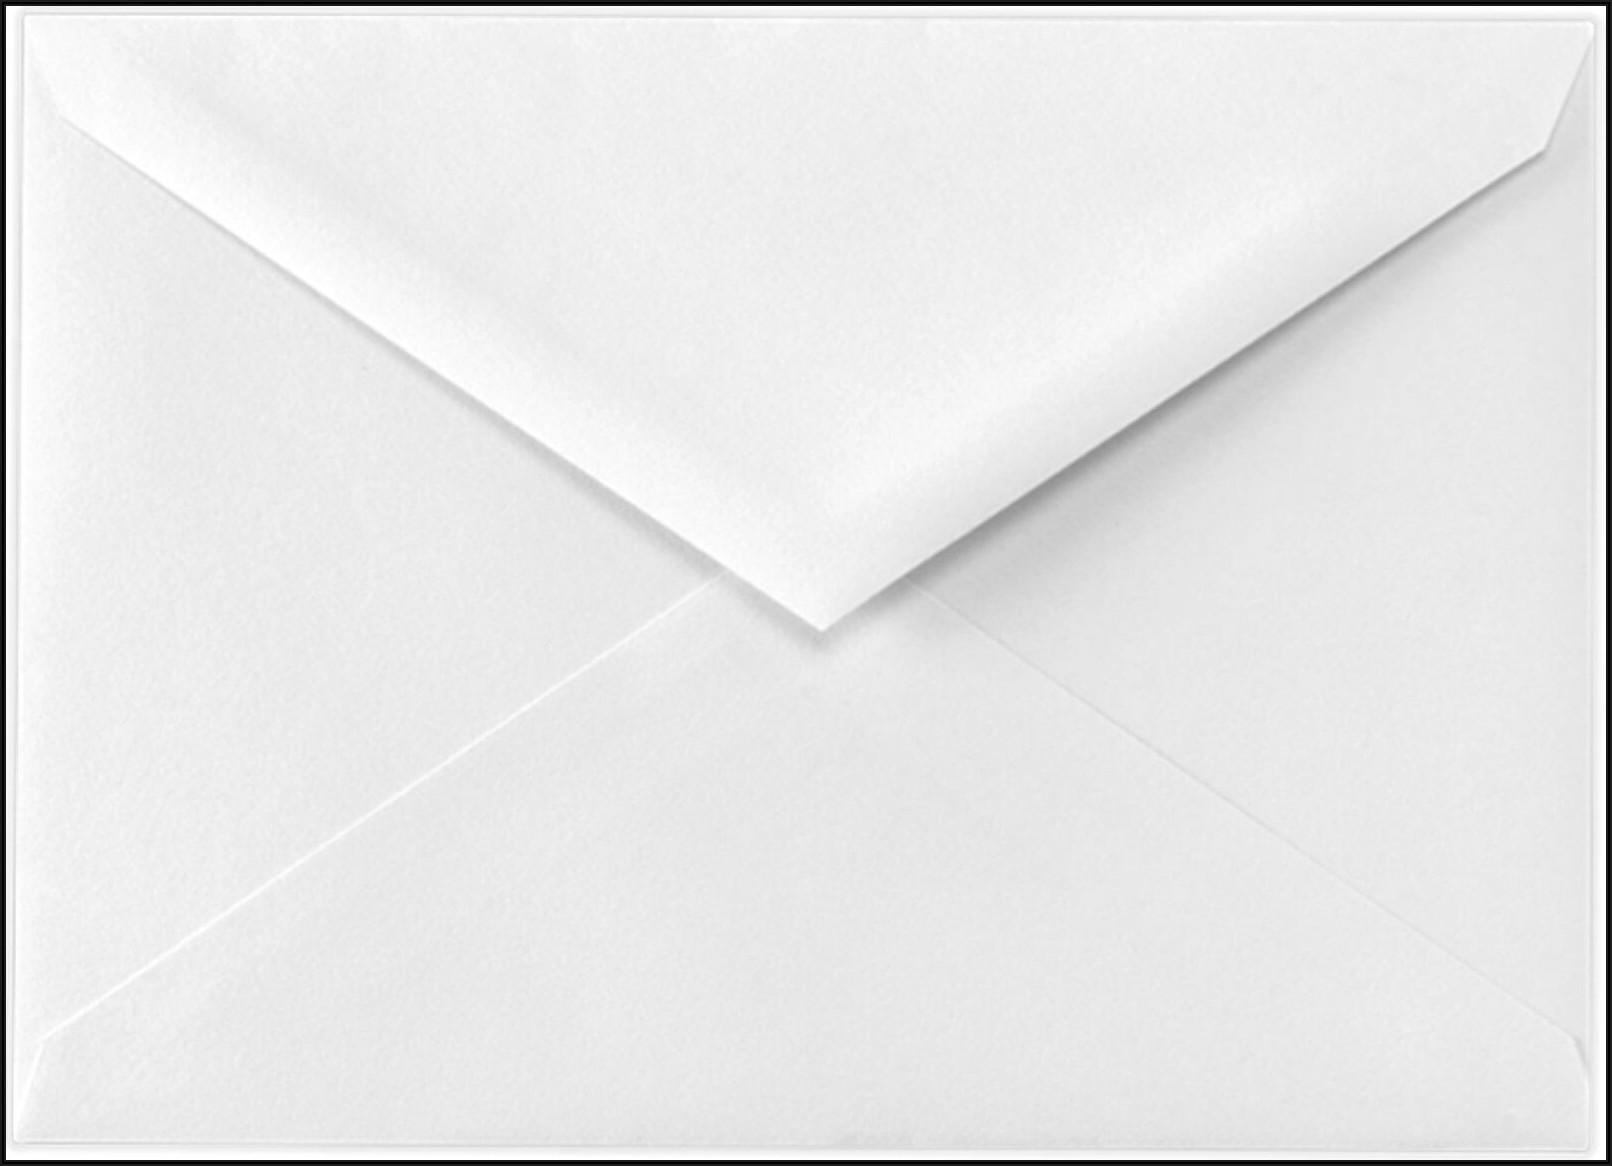 4 Bar Envelope Size